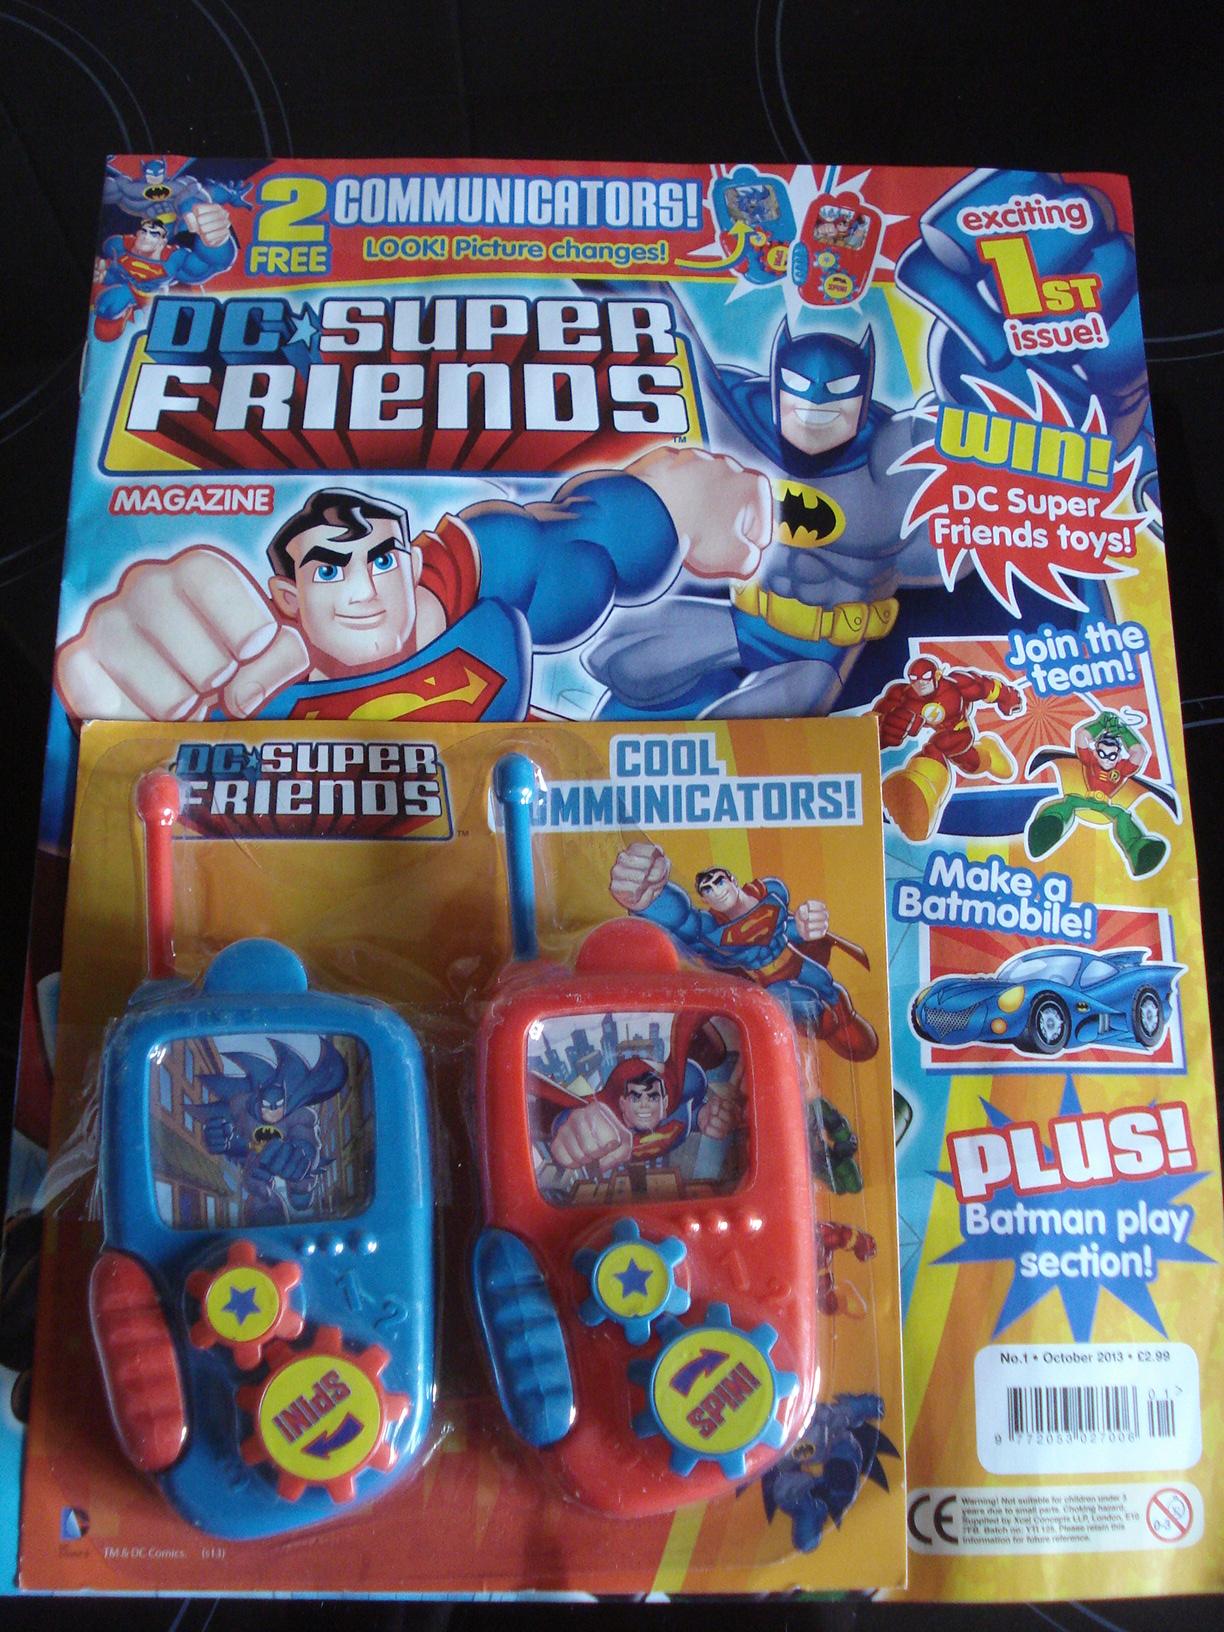 DC Super Friends Magazine Over 40 and a Mum to e